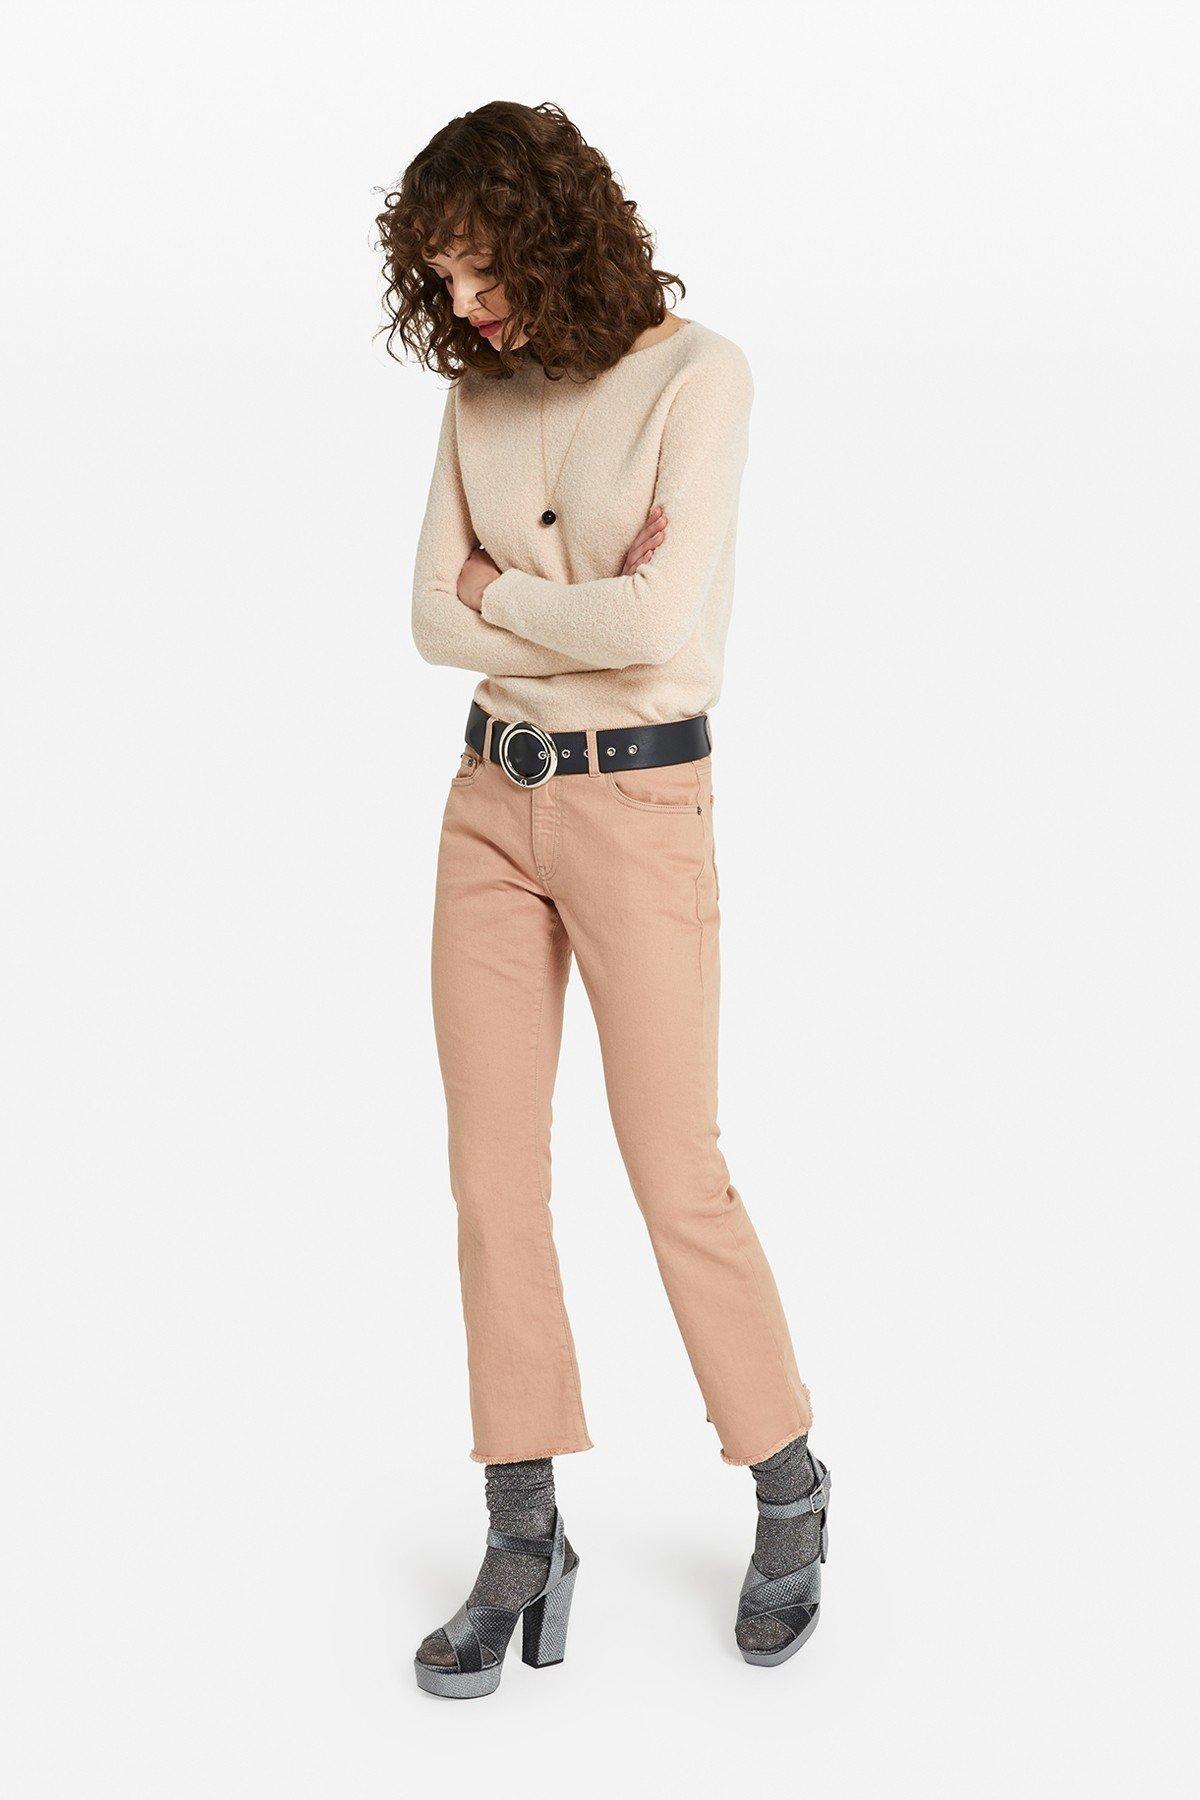 Kick flare denim trousers